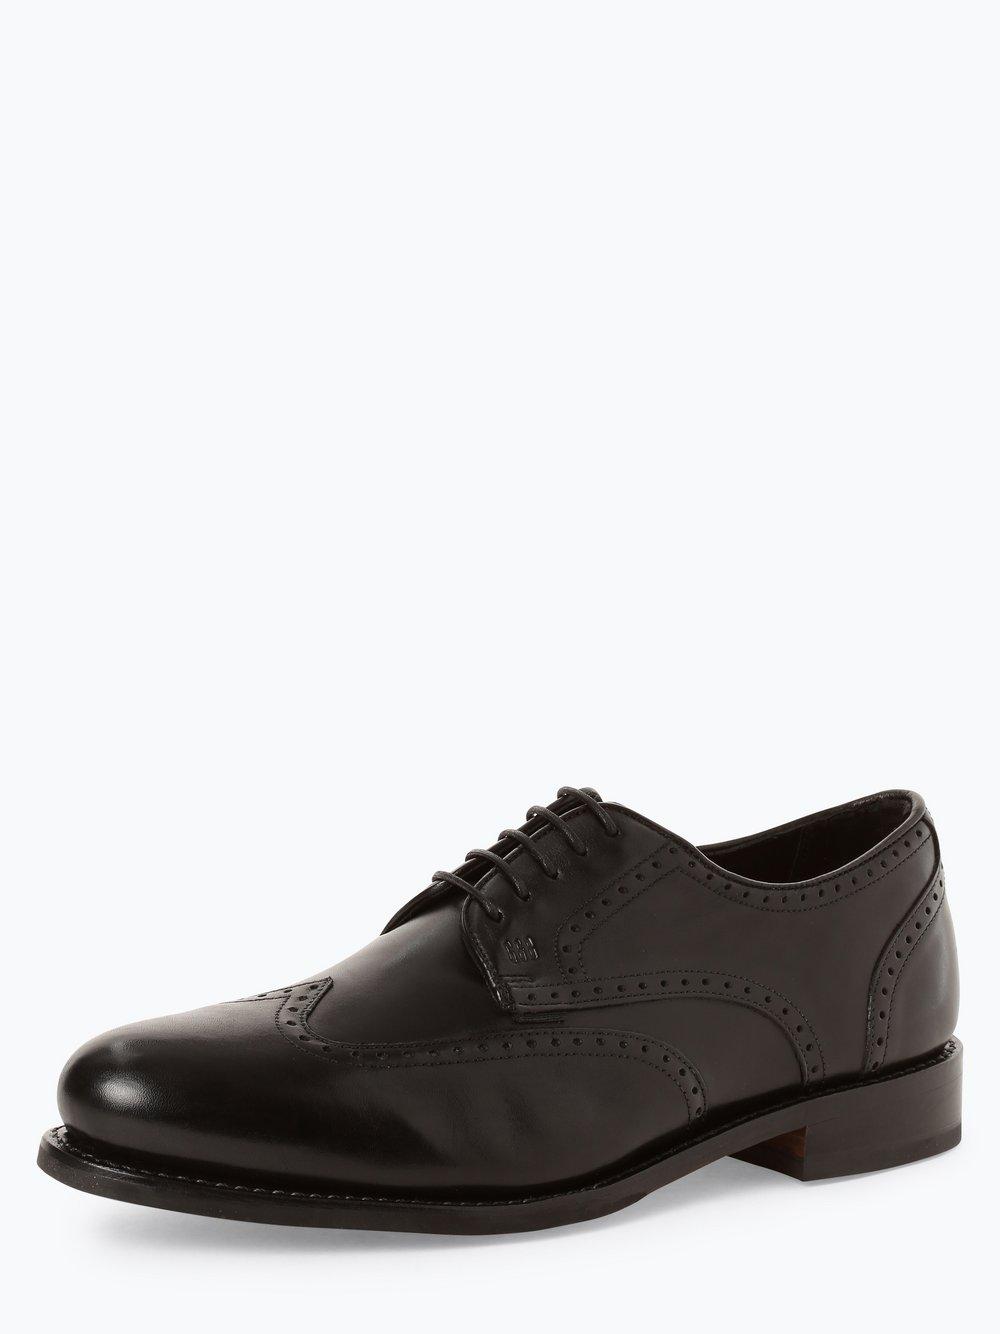 Gordon & Bros. - Męskie buty ze skóry – Levet, czarny